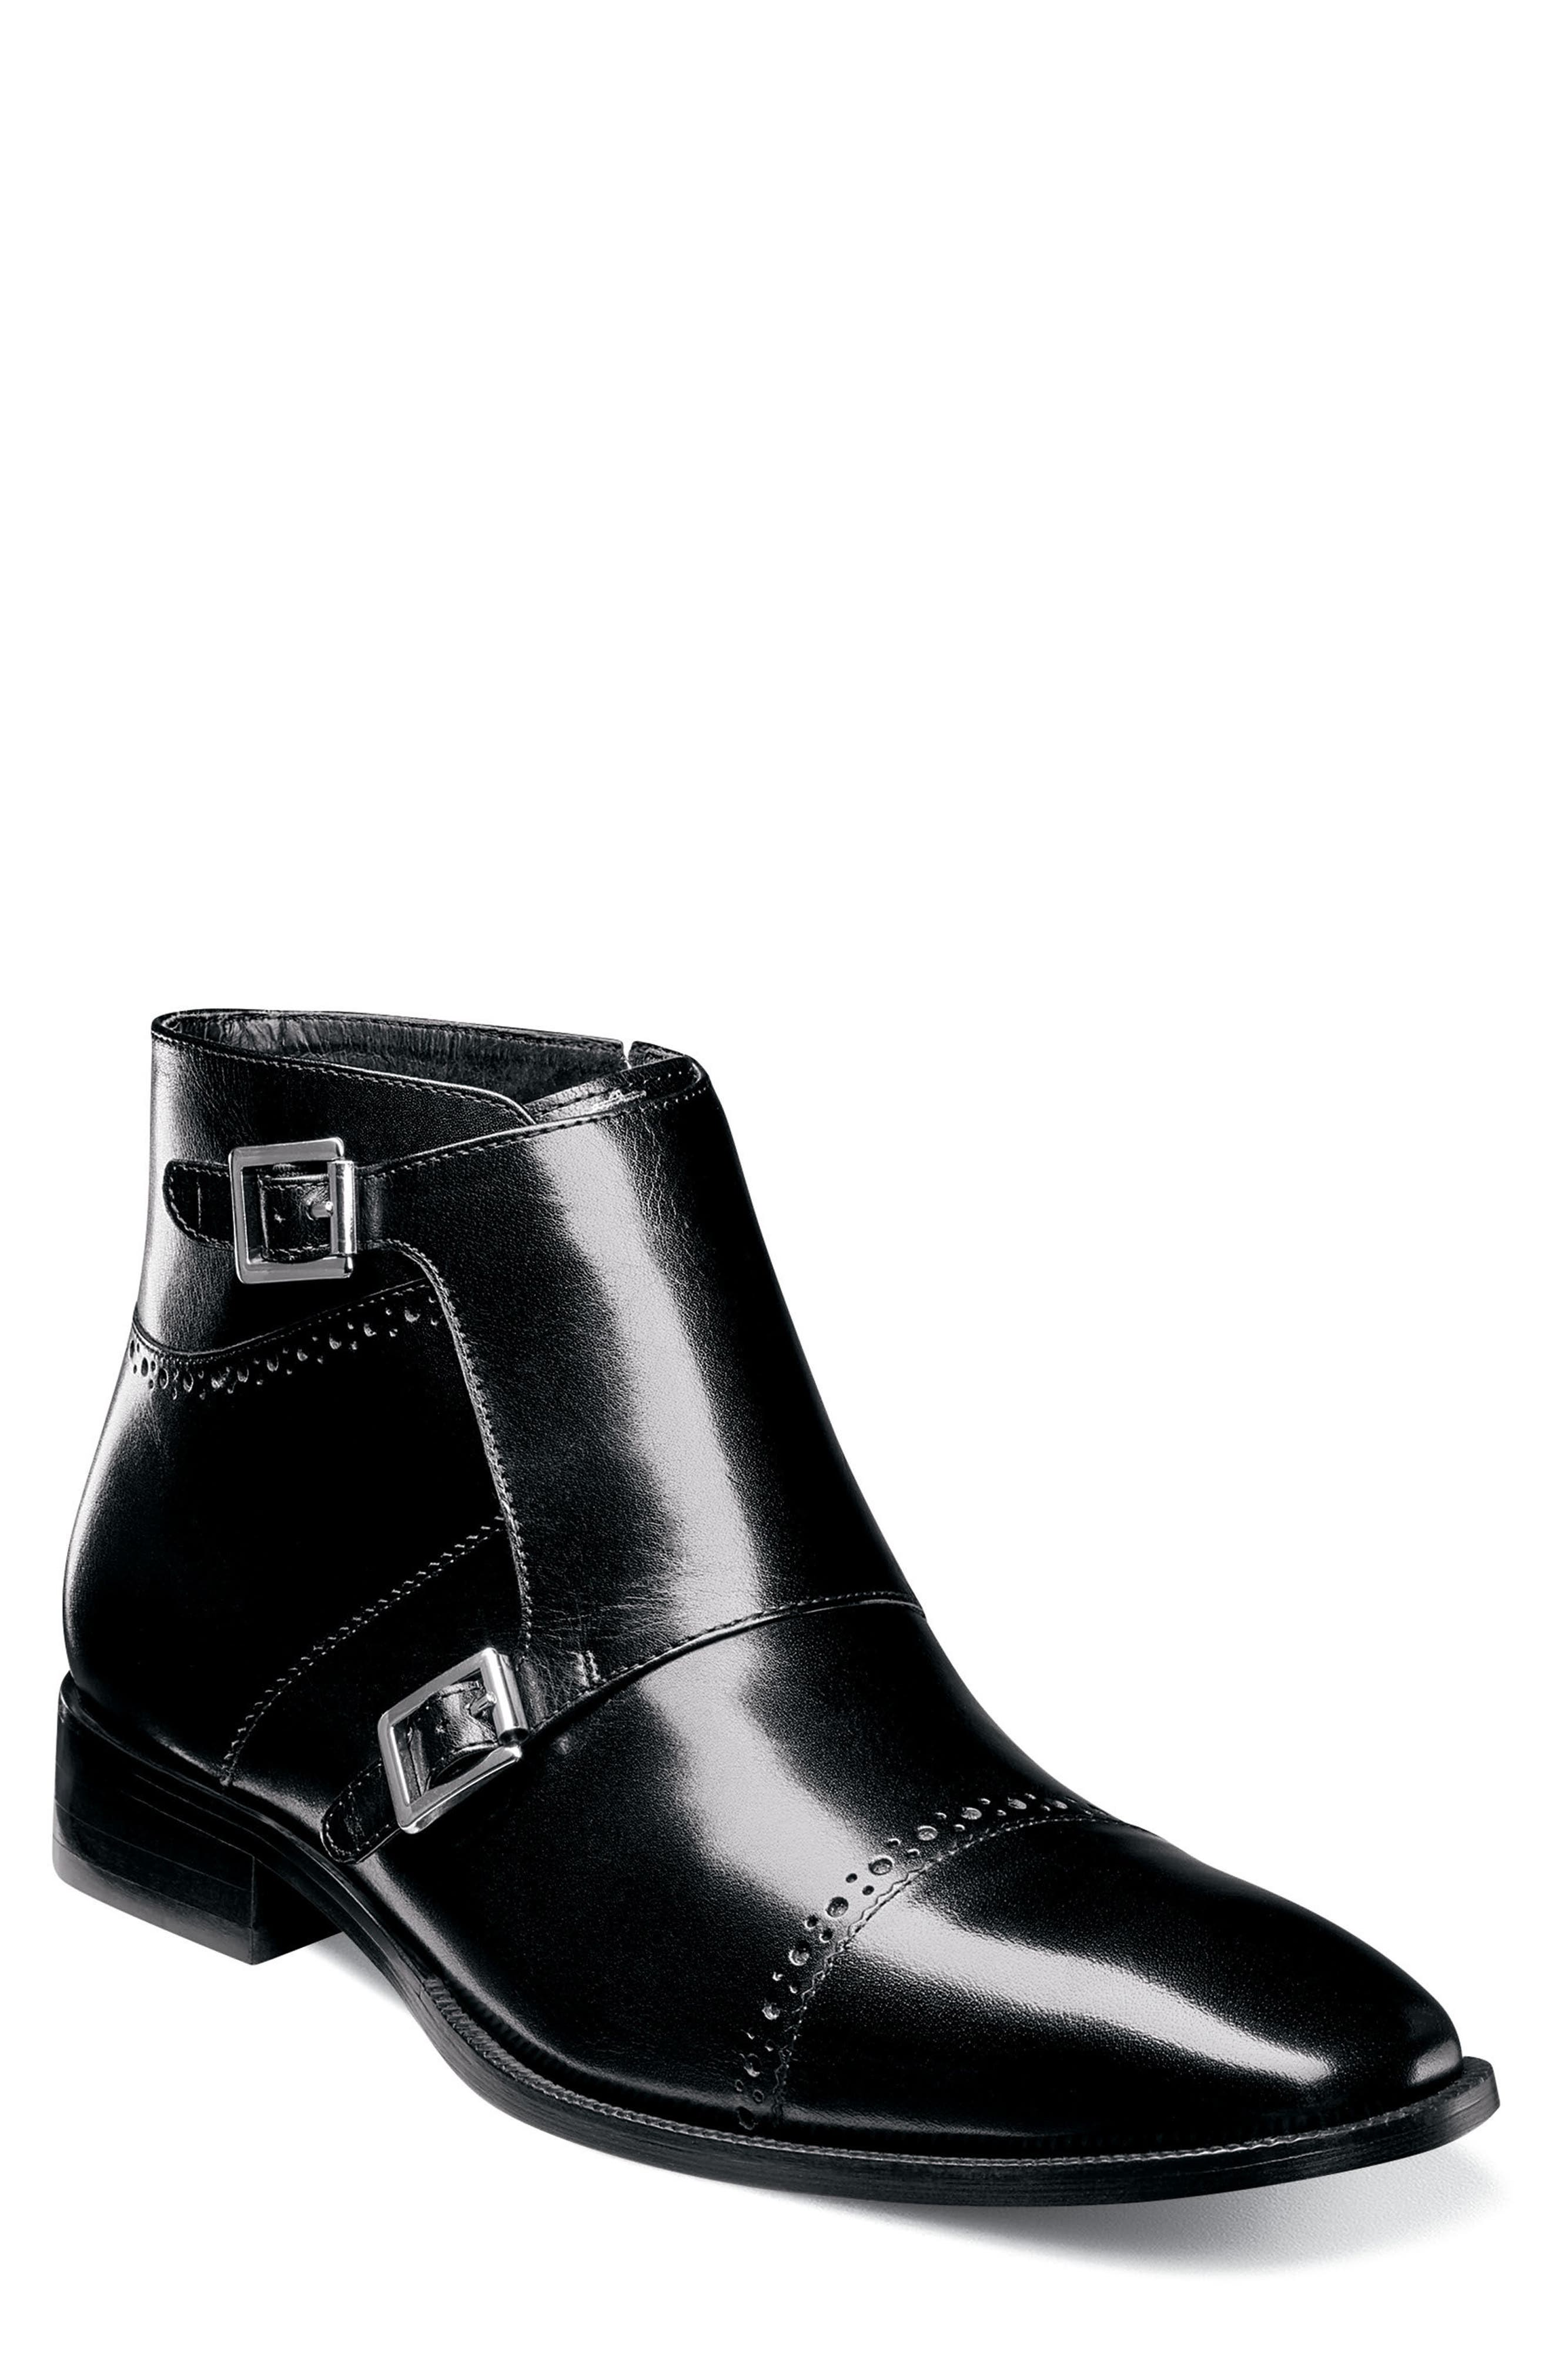 Kason Double Monk Strap Boot,                         Main,                         color, Black Leather